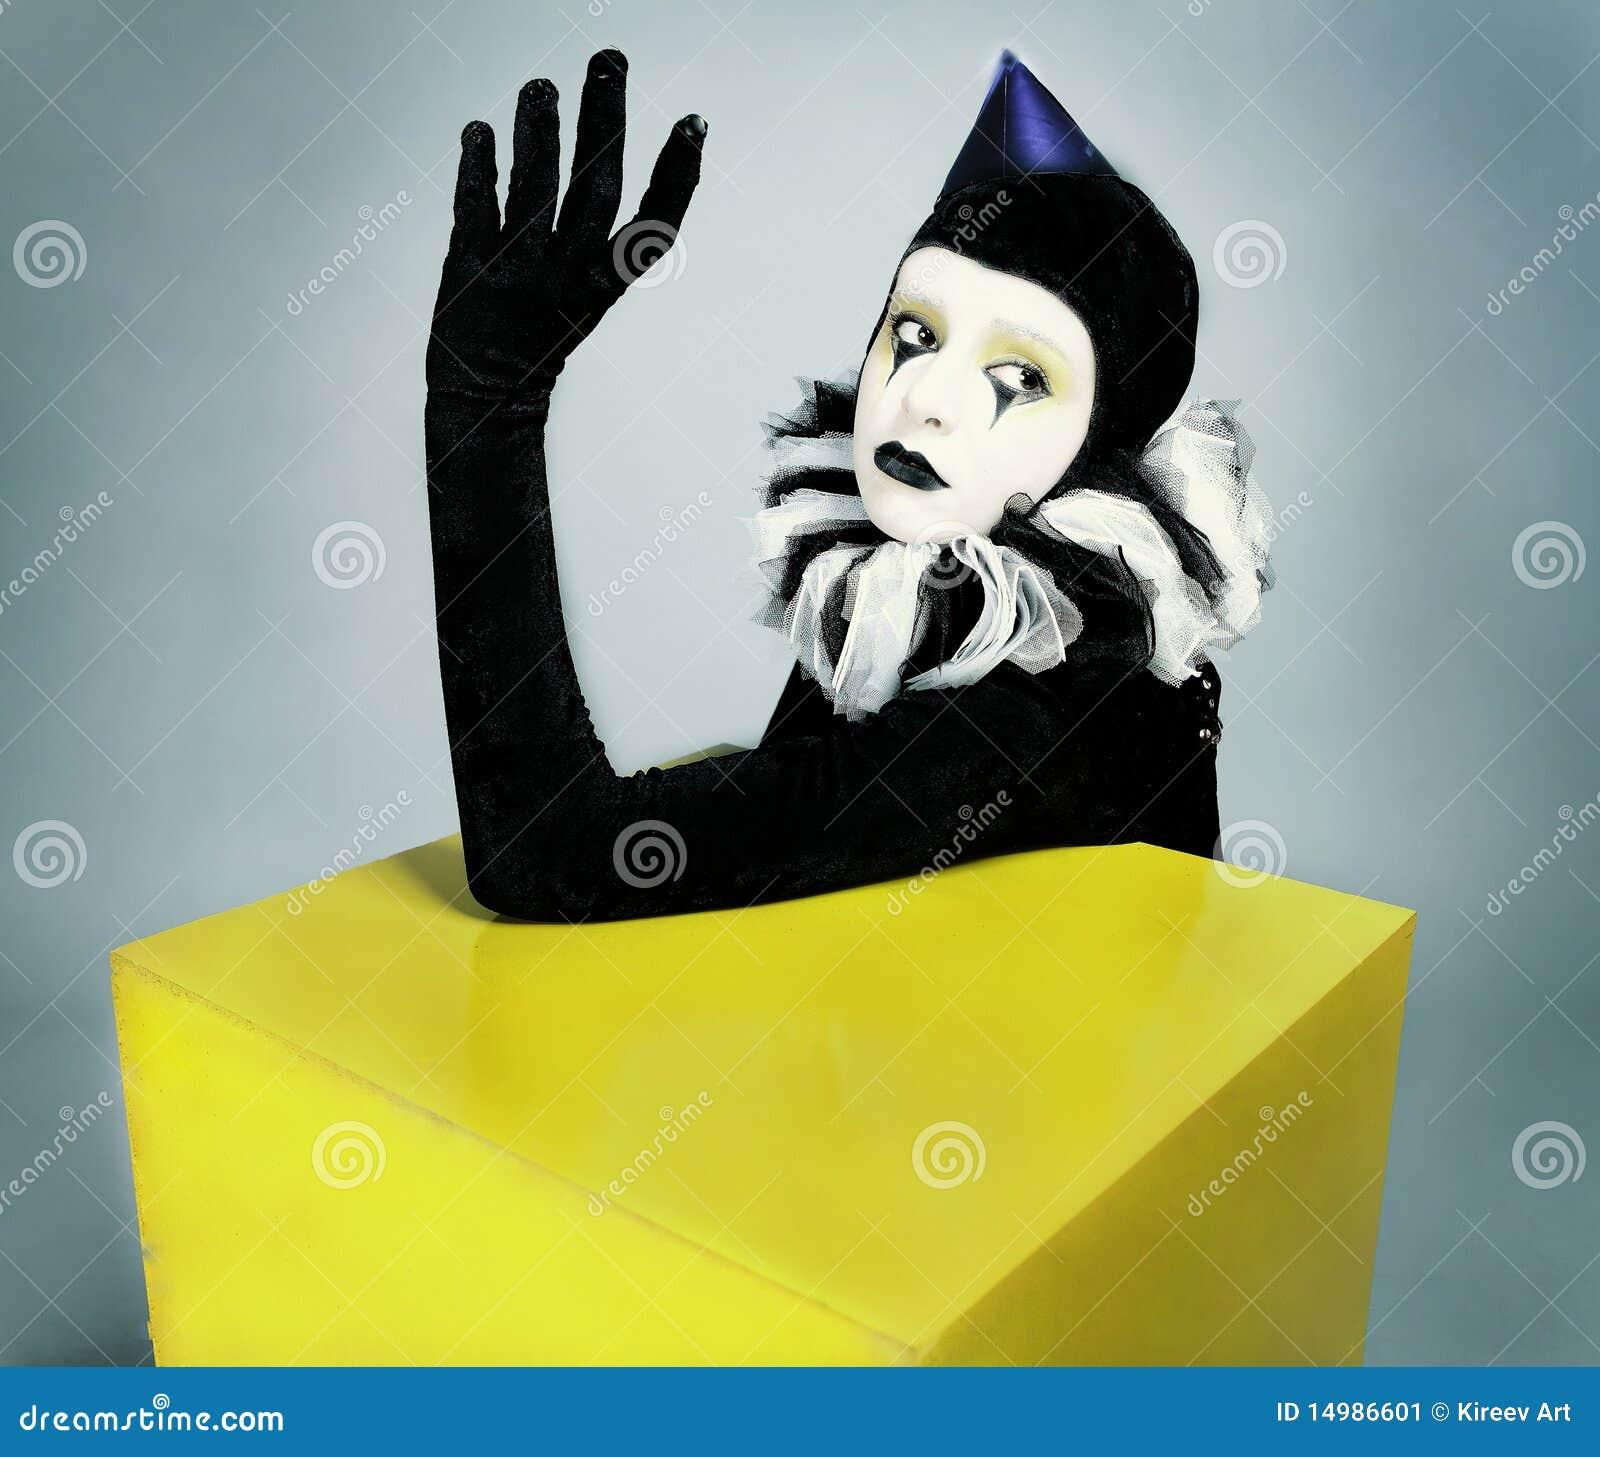 Circus fashion mime posing near a yellow square